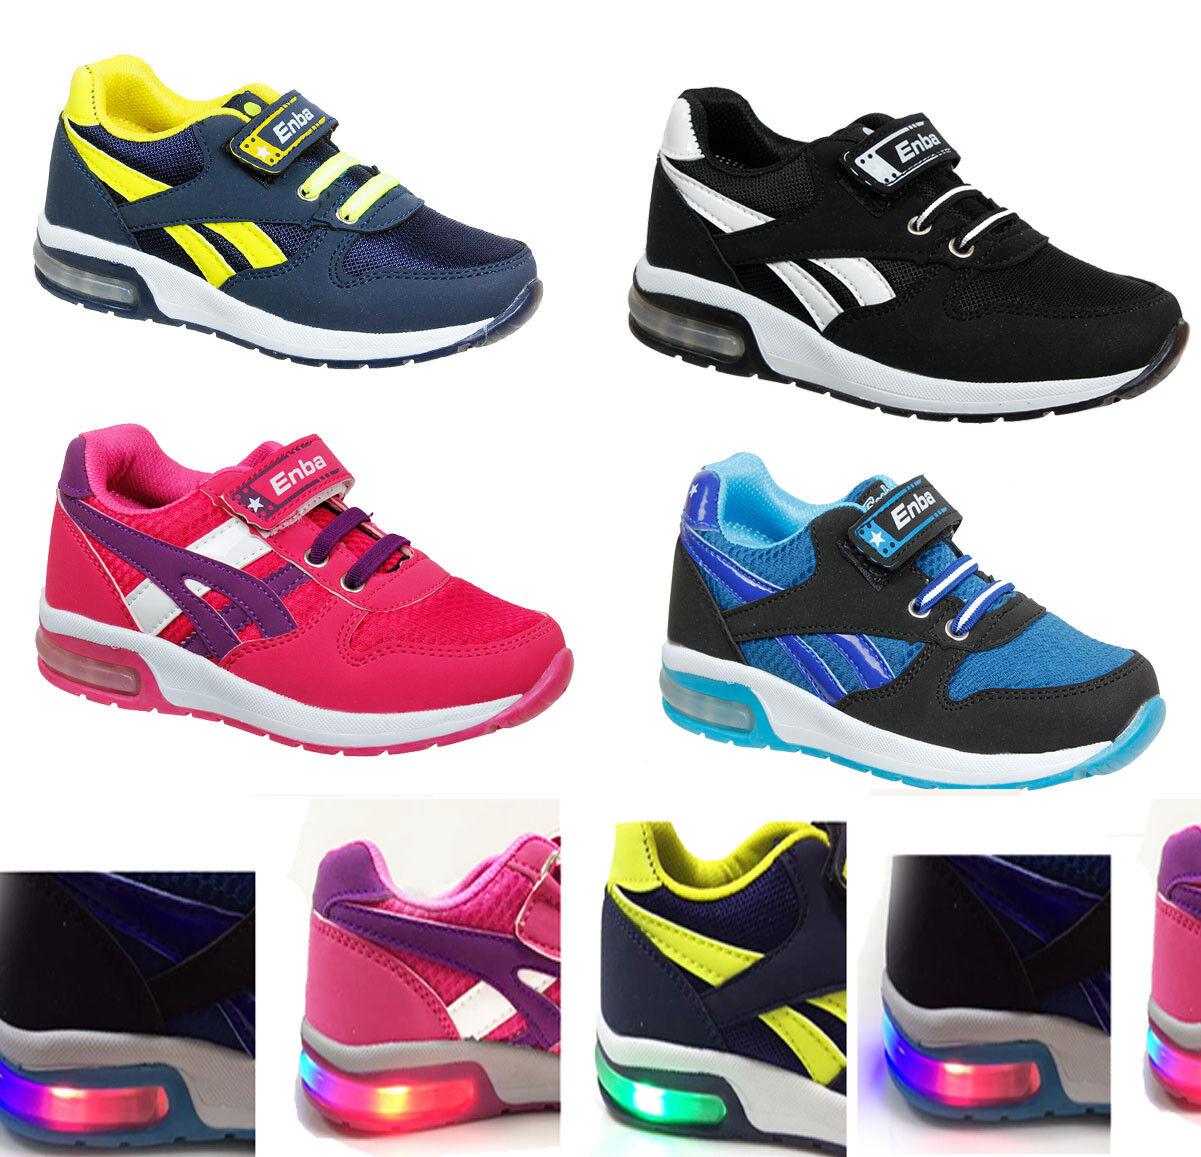 quality design 30b06 bd4f0 Led Schuhe Für Kinder Vergleich Test +++ Led Schuhe Für ...